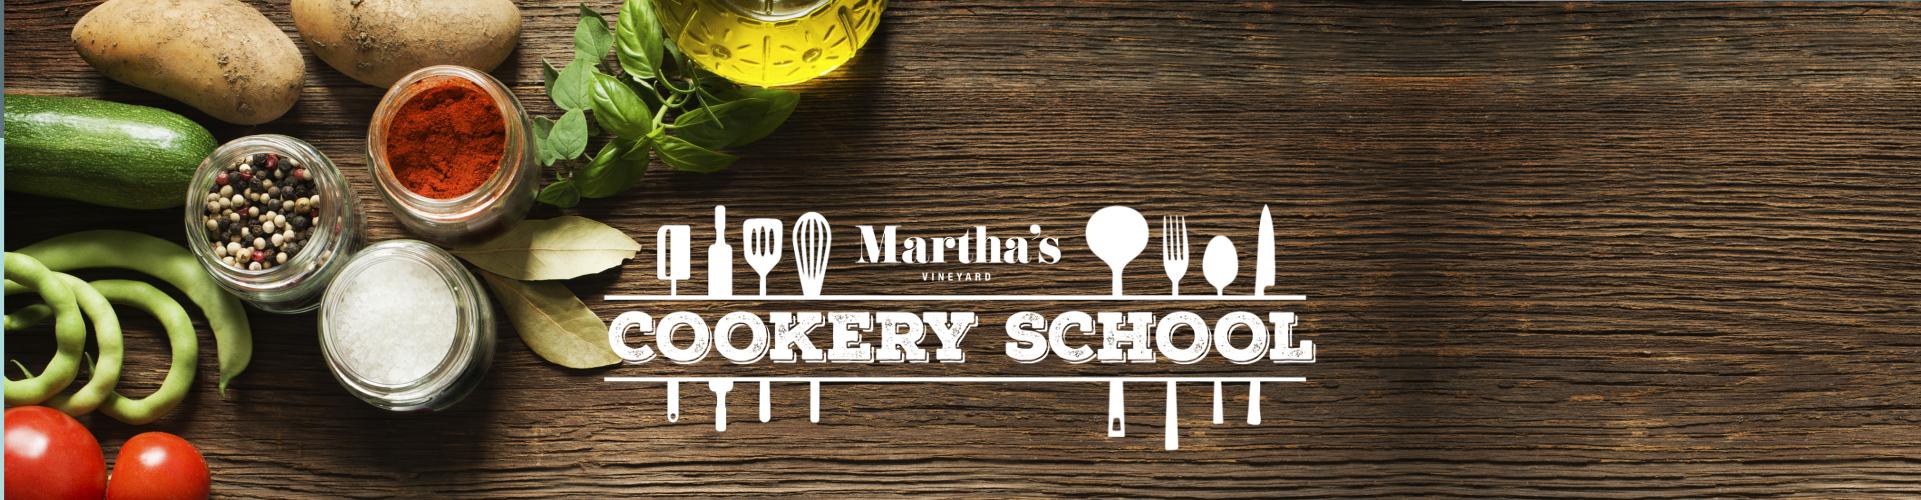 Martha's Cookery School